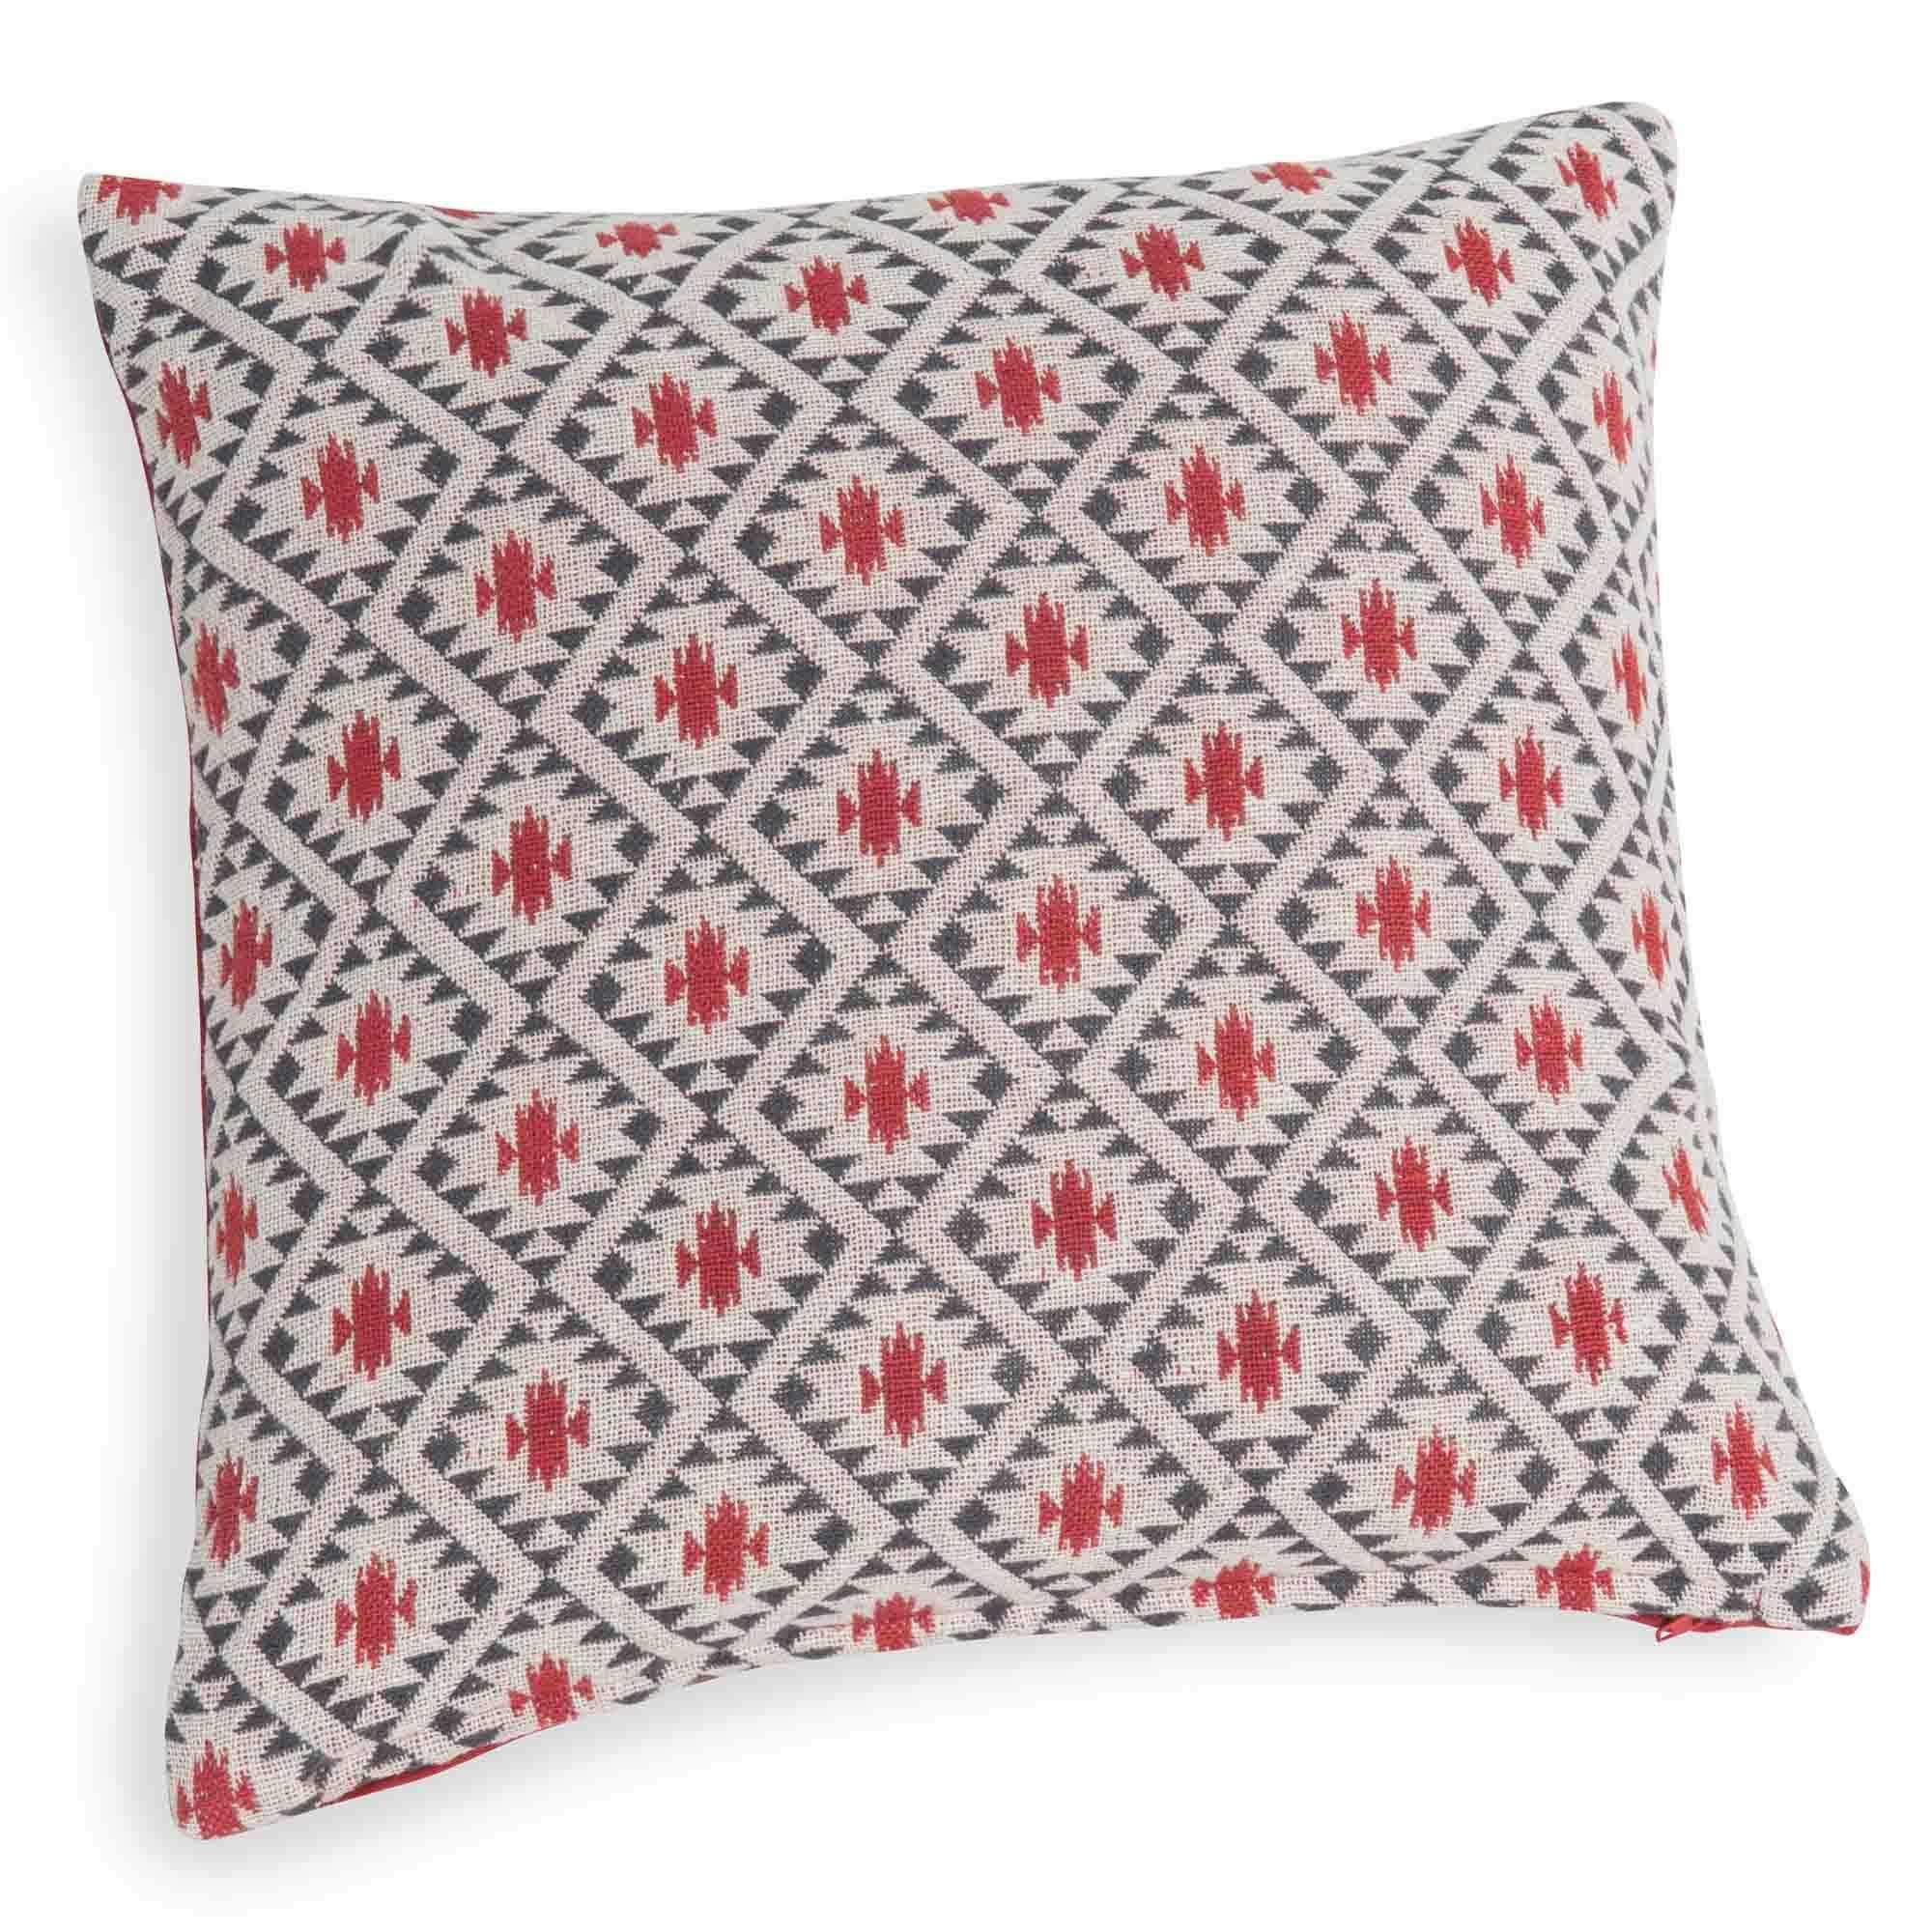 kissenbezug aus baumwolle mit rotem muster 40 x 40 cm jema living pinterest wohnen. Black Bedroom Furniture Sets. Home Design Ideas